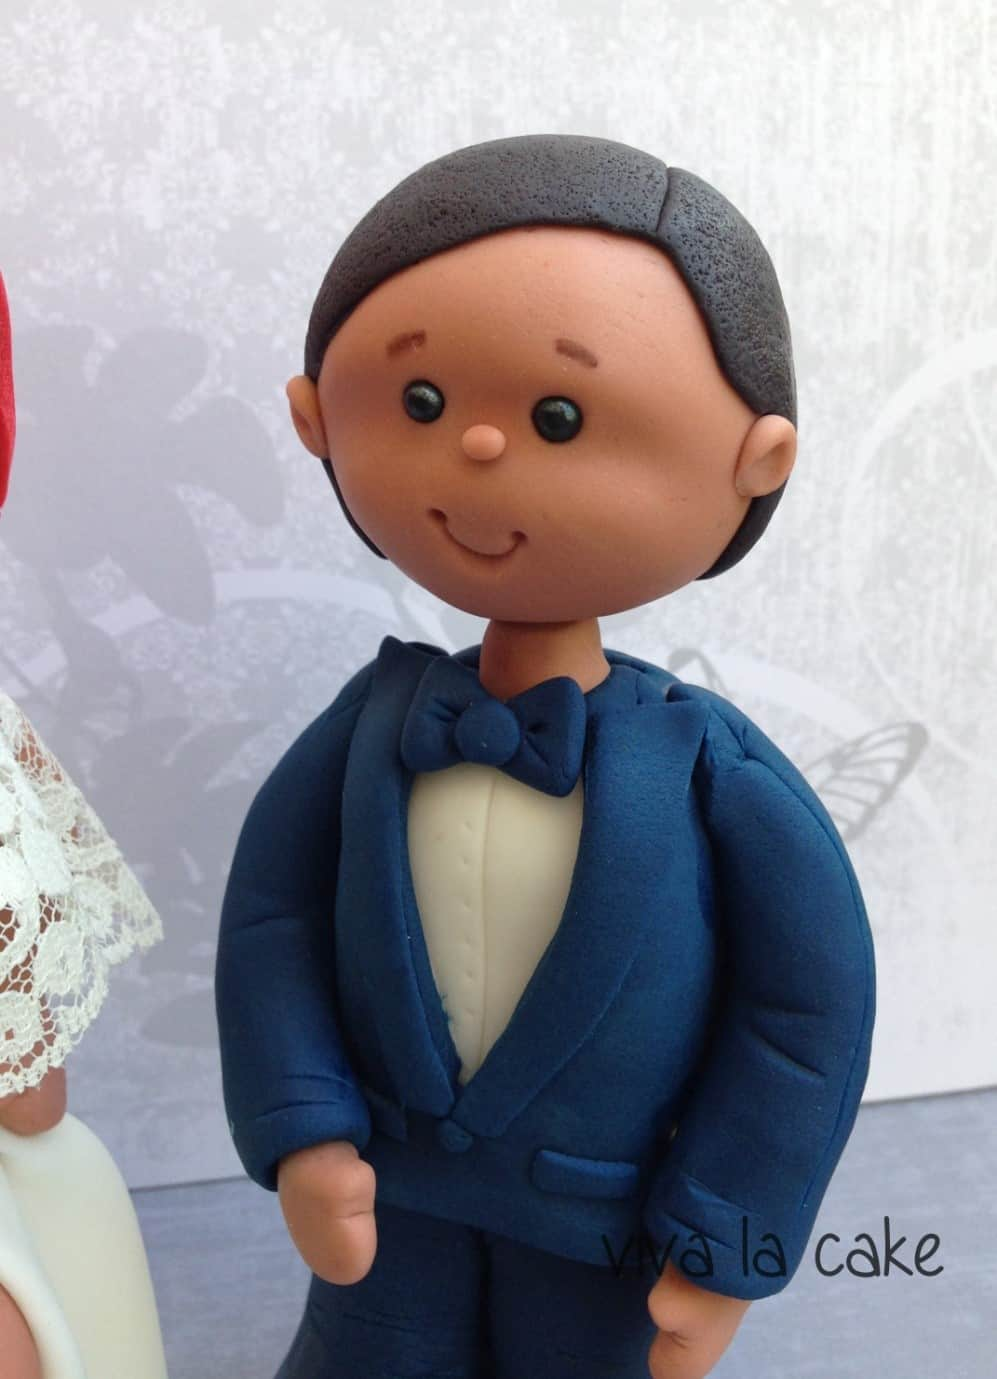 Groom Figurine Cake Topper Tutorial